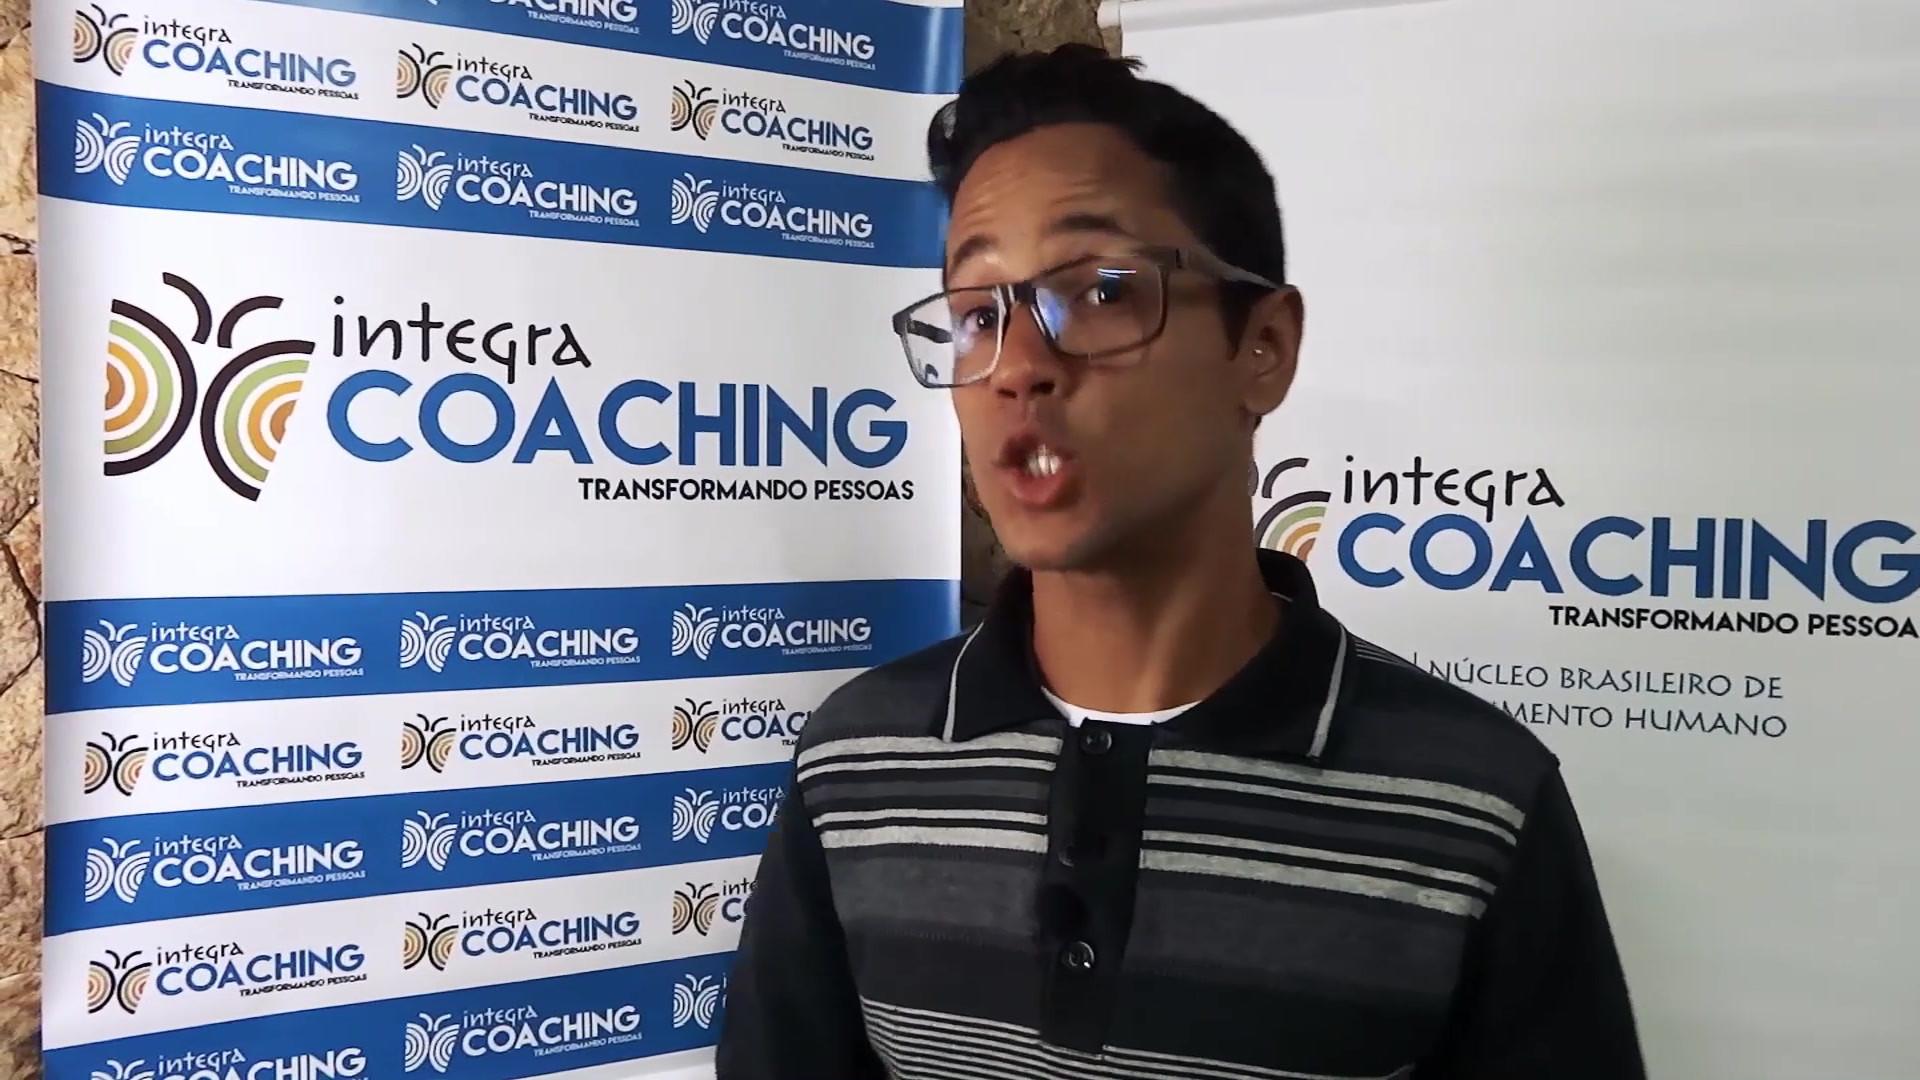 Edosn_Integra_Coaching.mp4